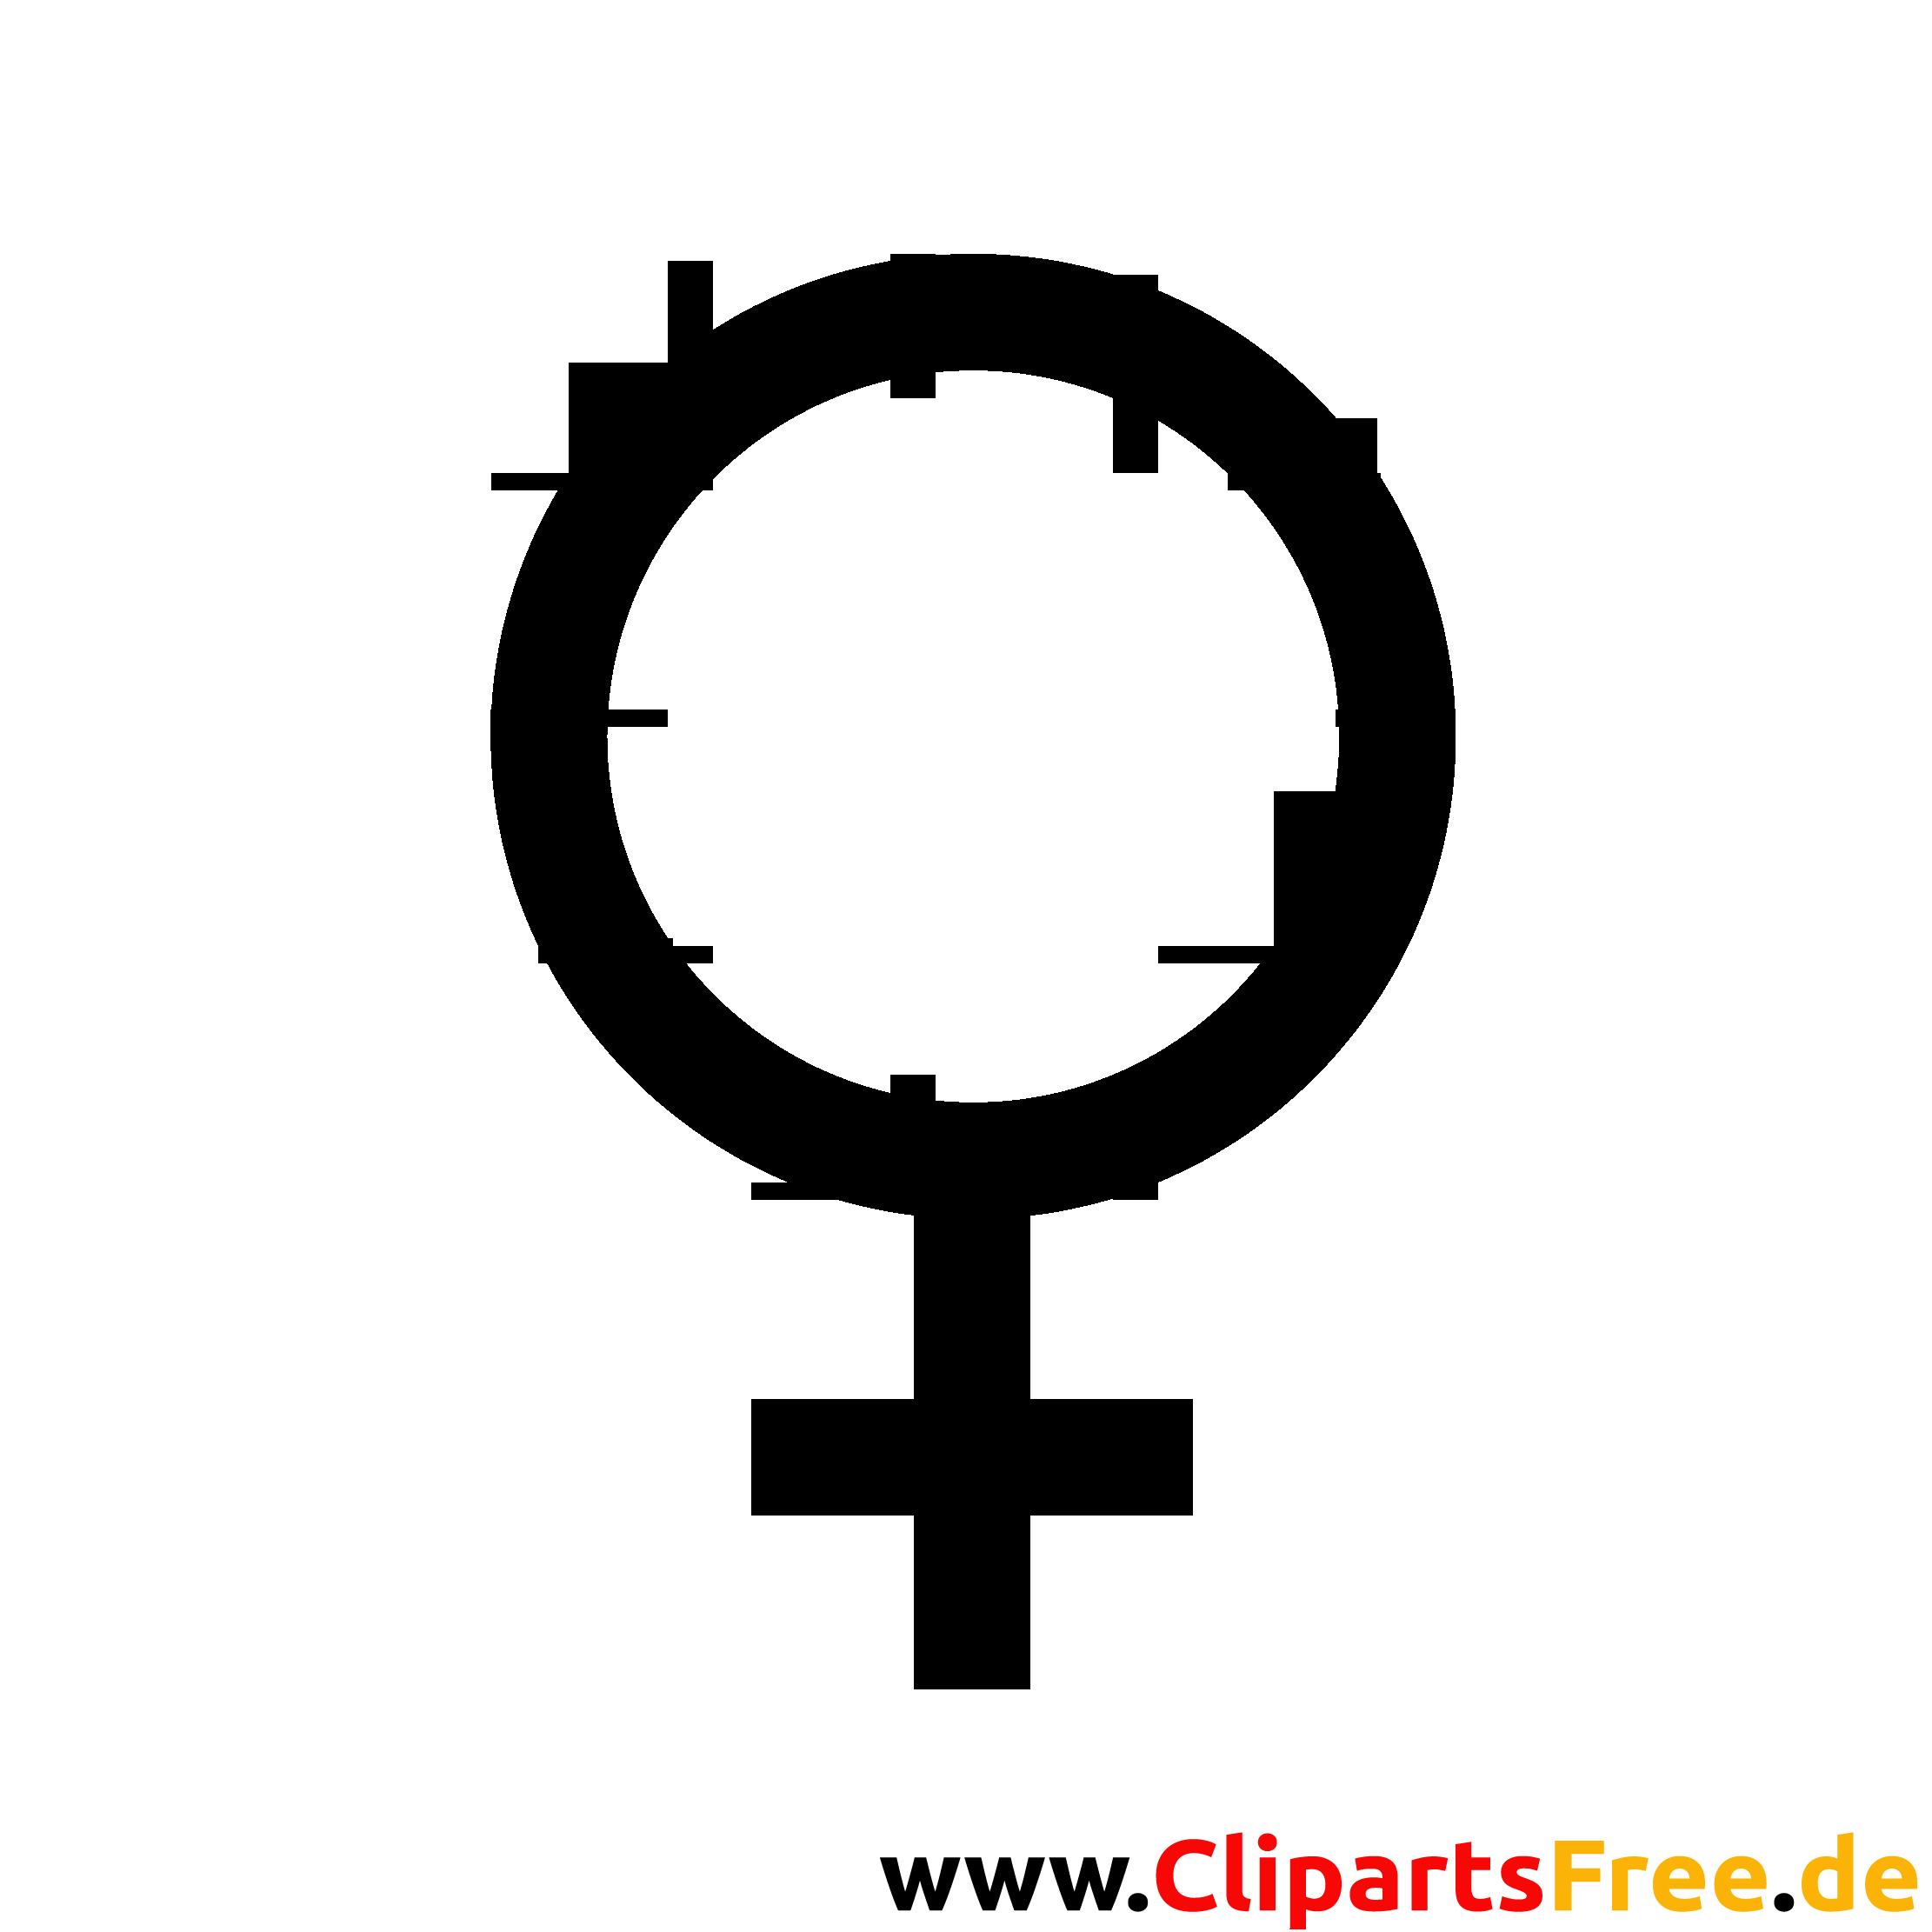 Venussymbol Clipart, Bild, Grafik schwarz-weiss gratis